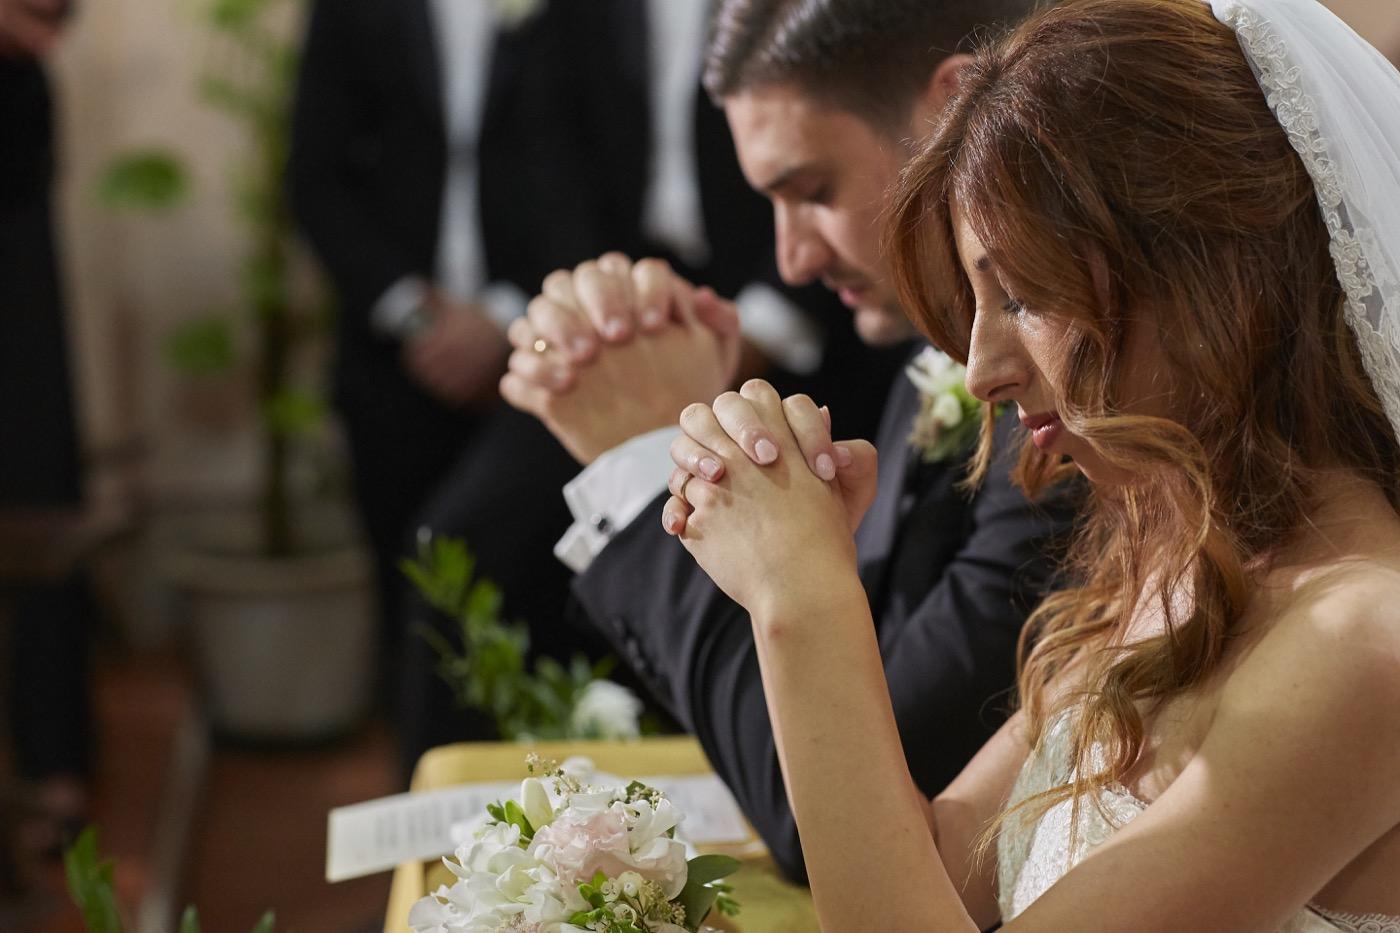 Claudio-Coppola-wedding-photographer-abbazia-7-frati-piegaro-50